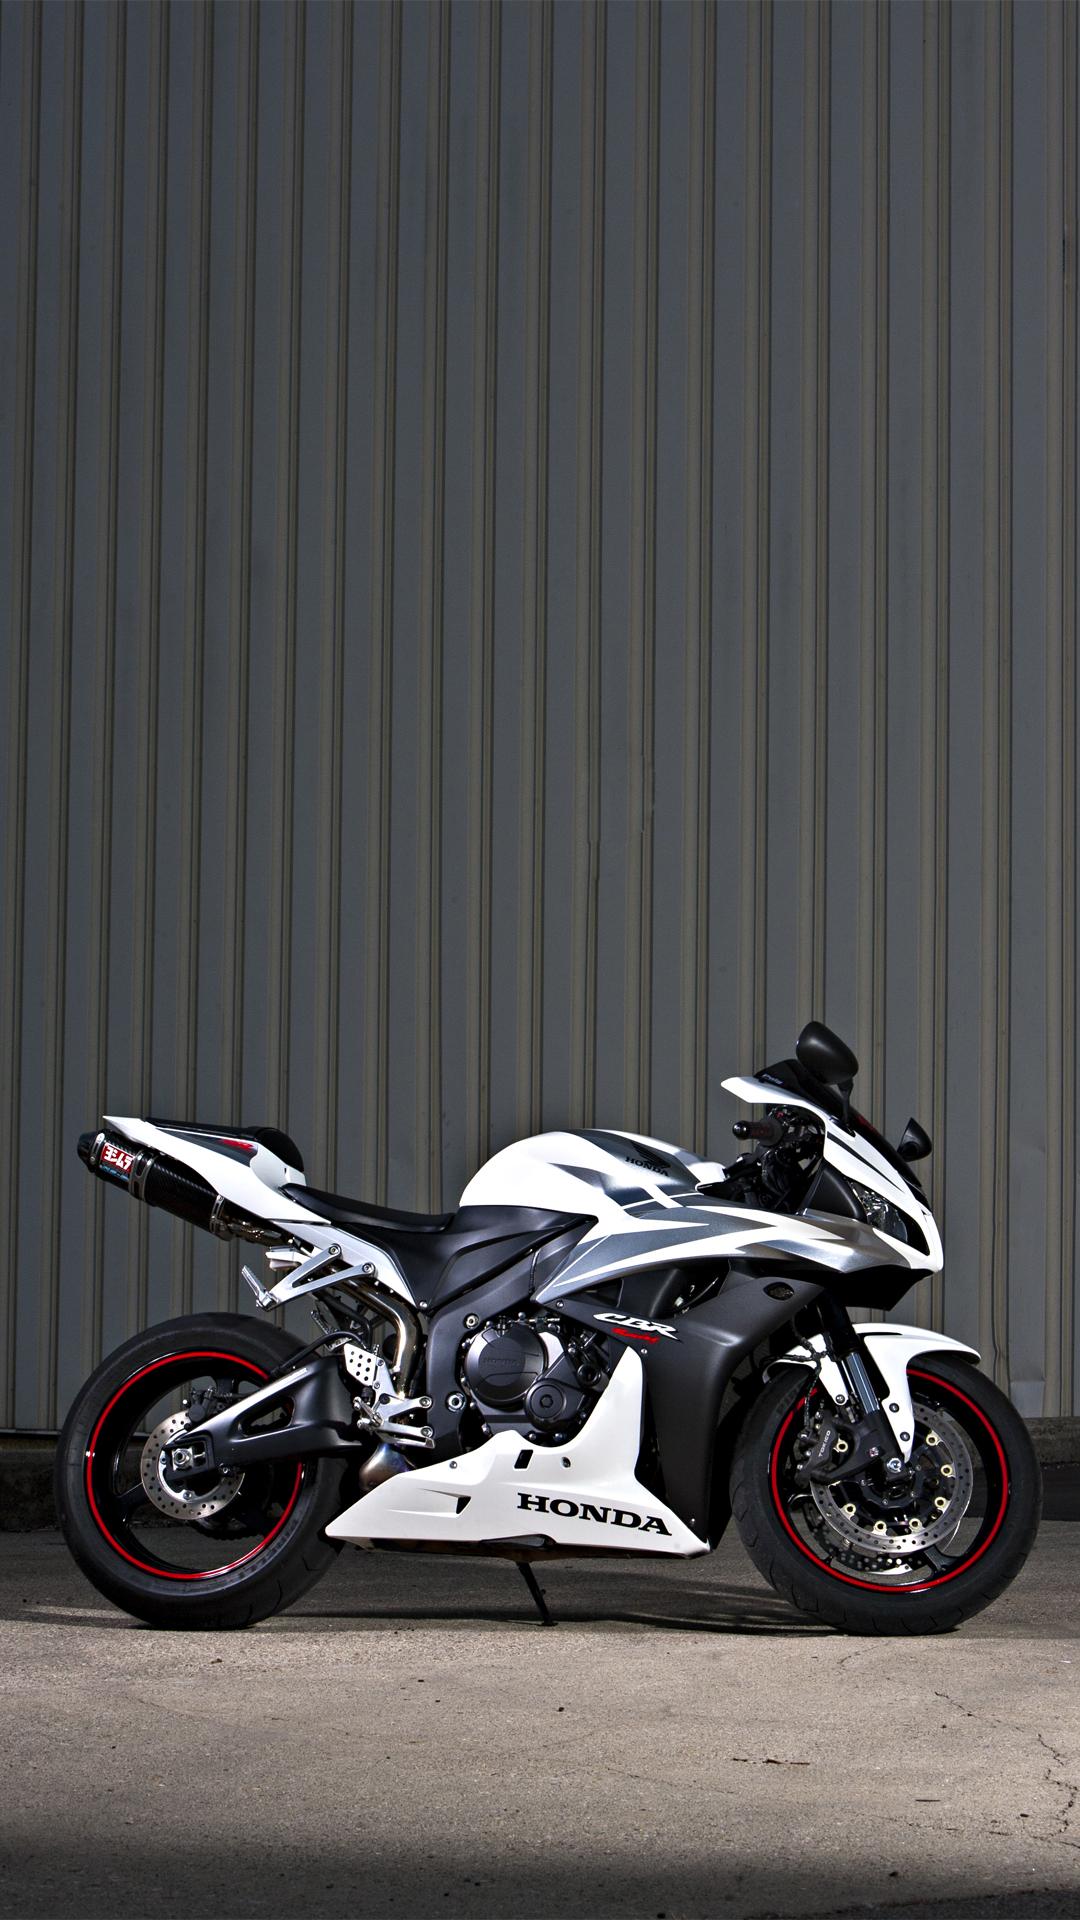 Honda CBR htc one wallpaper